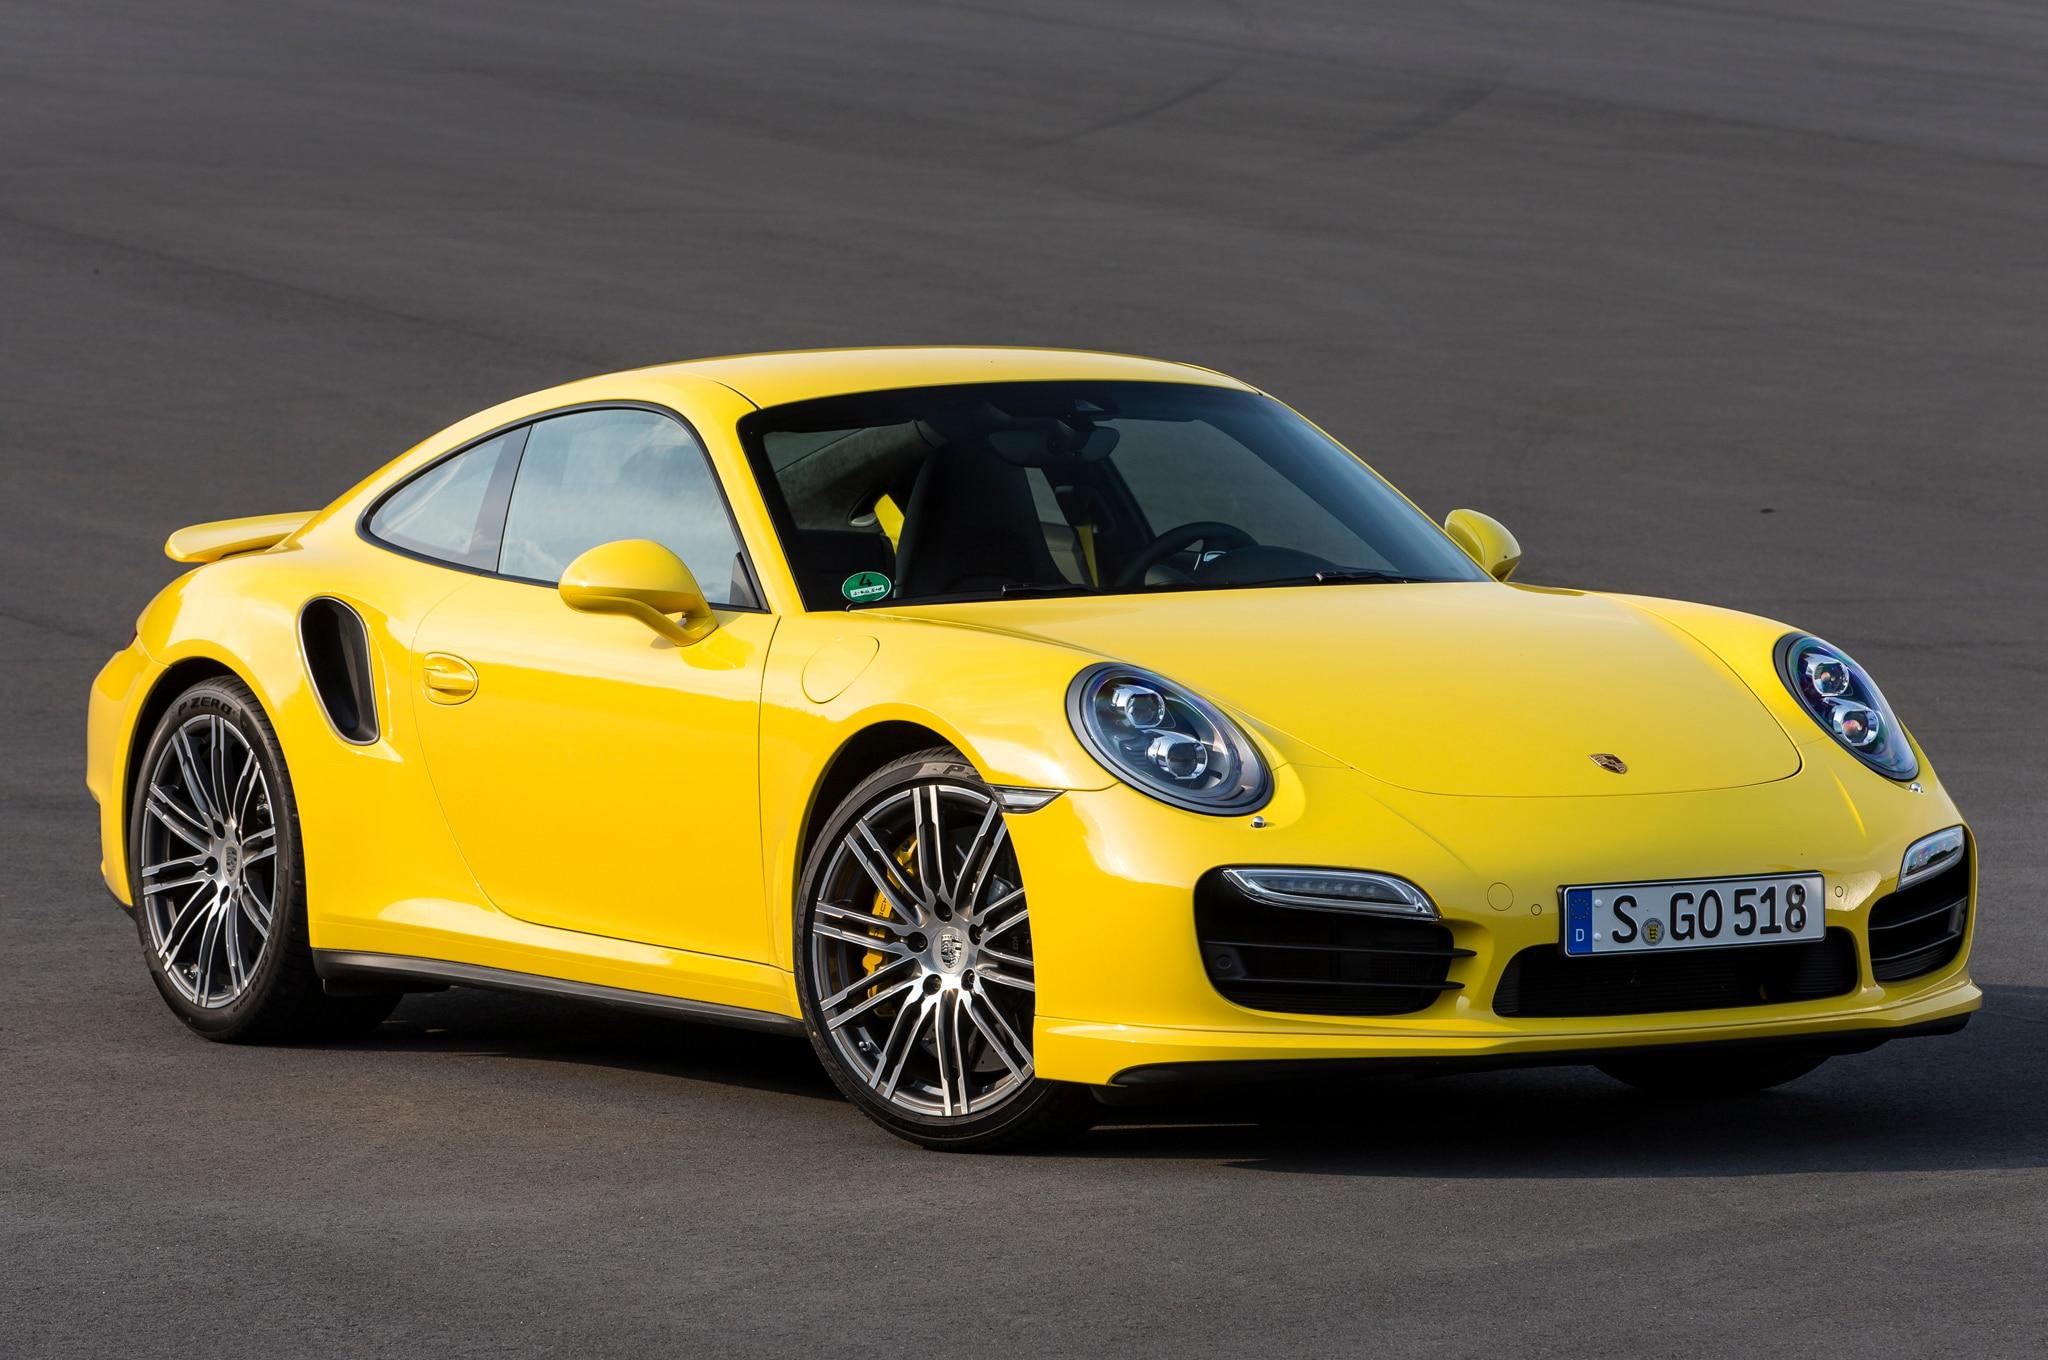 2014 Porsche 911 Turbo Front Three Quarters1